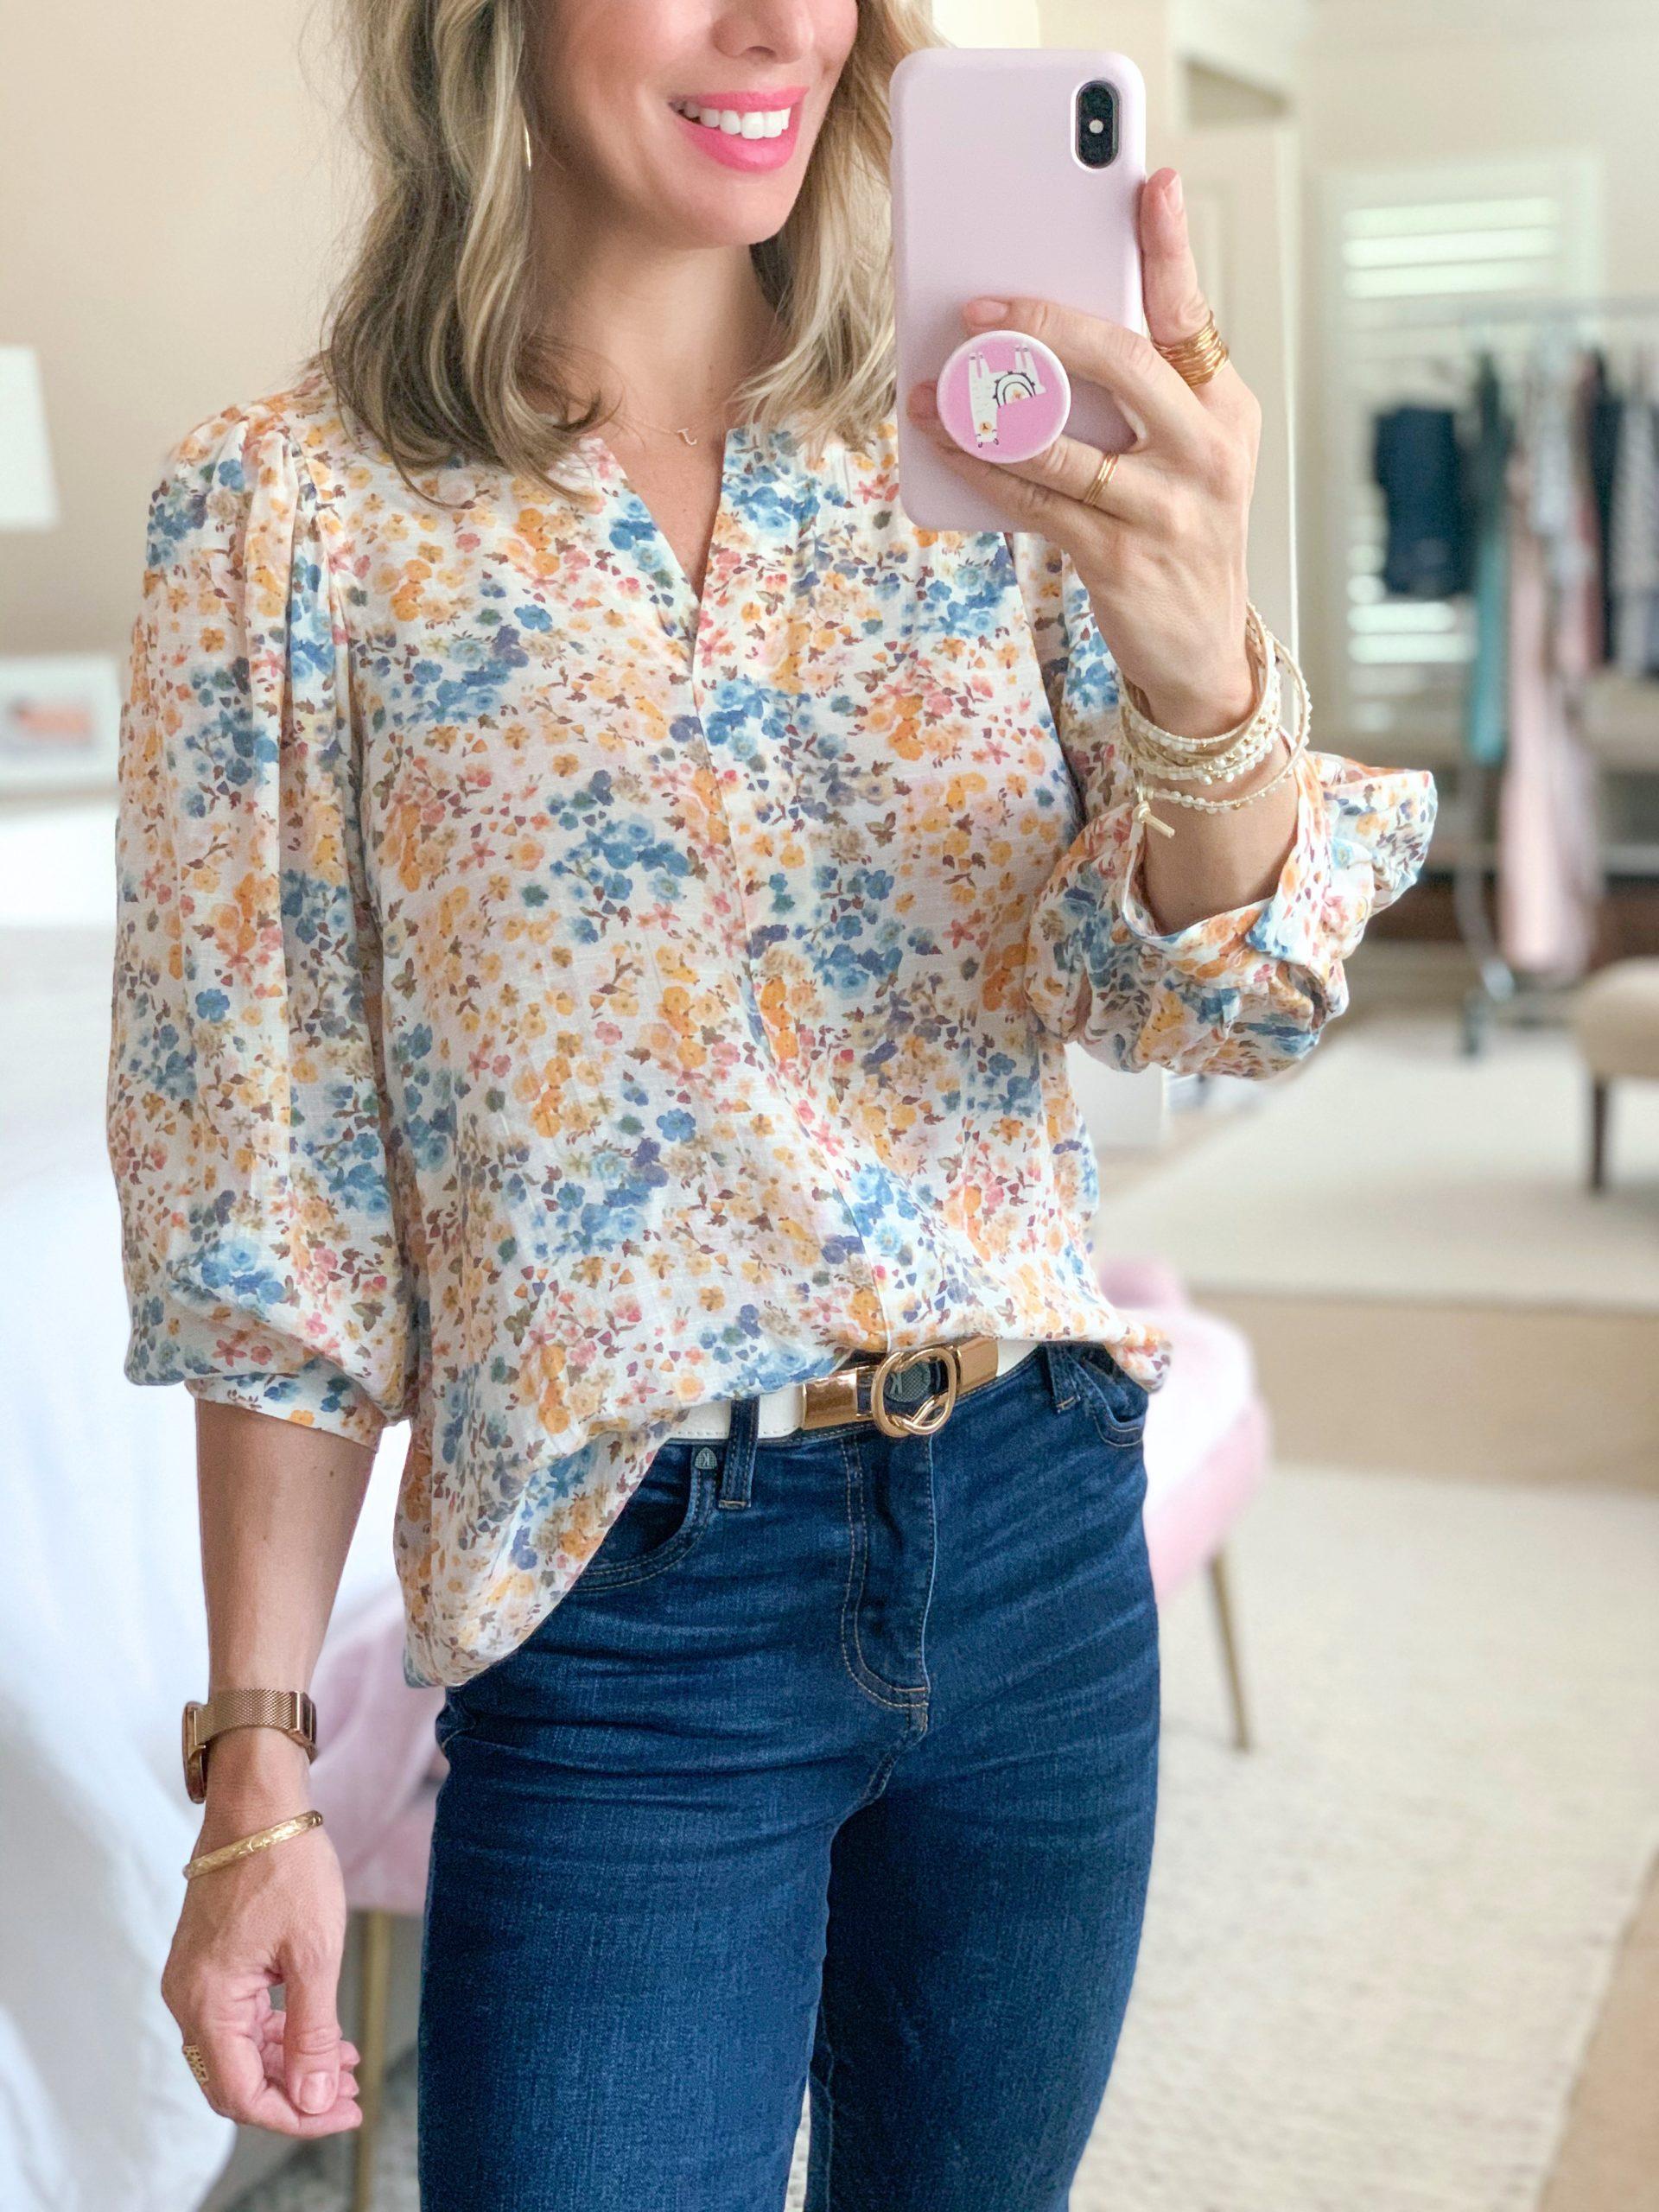 Spring Outfit Nordstrom & JCP: Crew Split Neck Floral Top, Dark Denim Jeans, Gold/White Belt